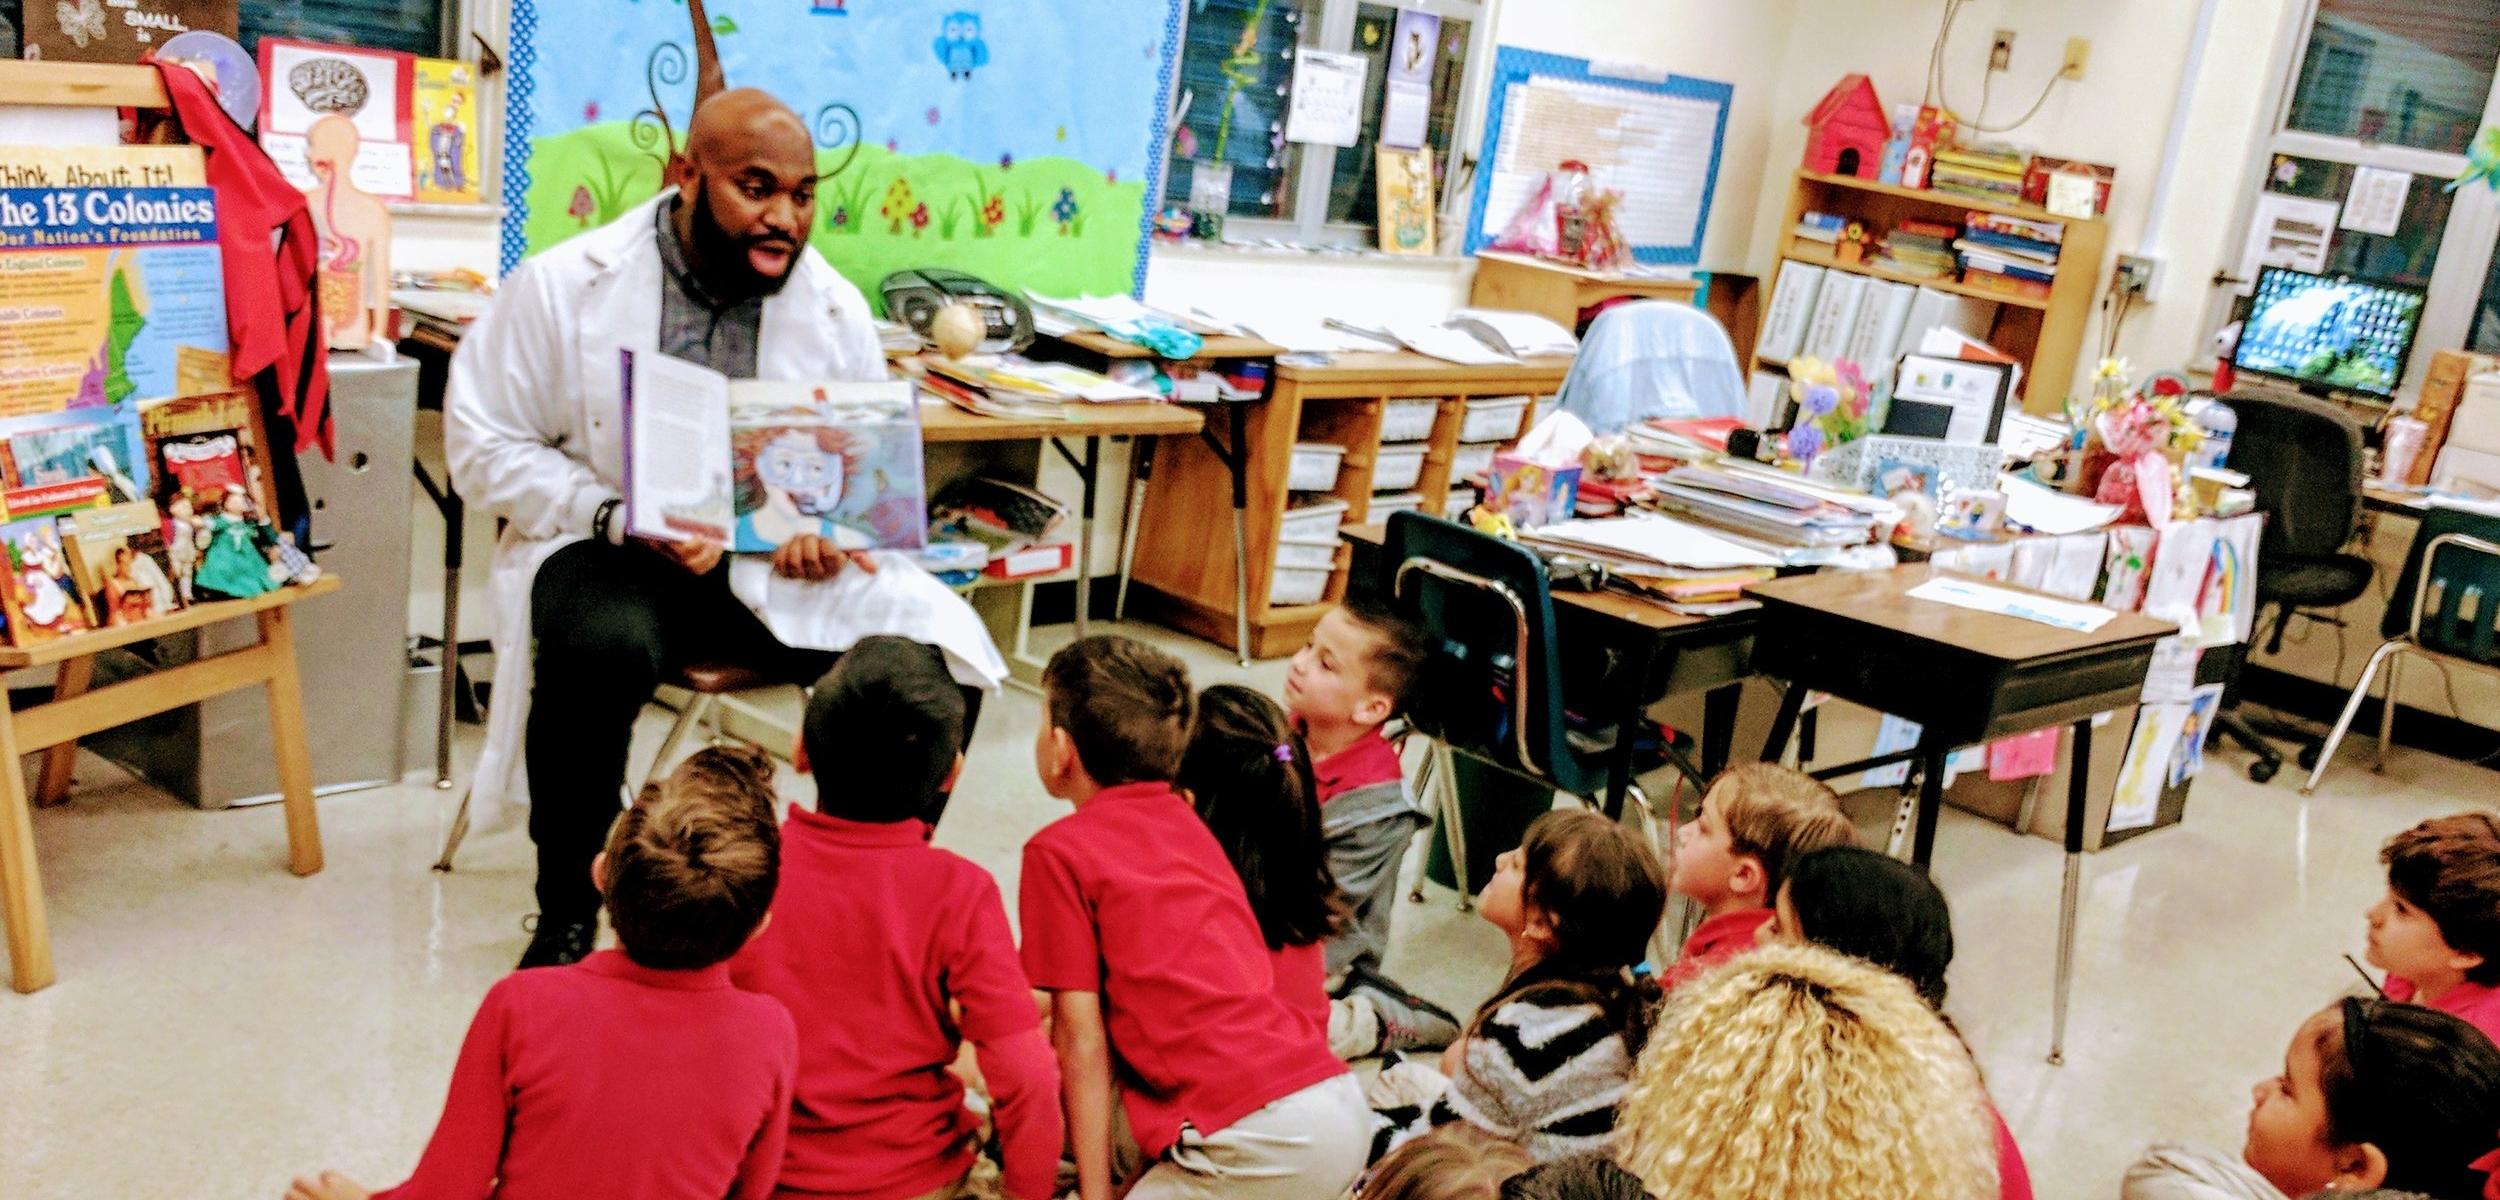 Maikel reading to elementary school children